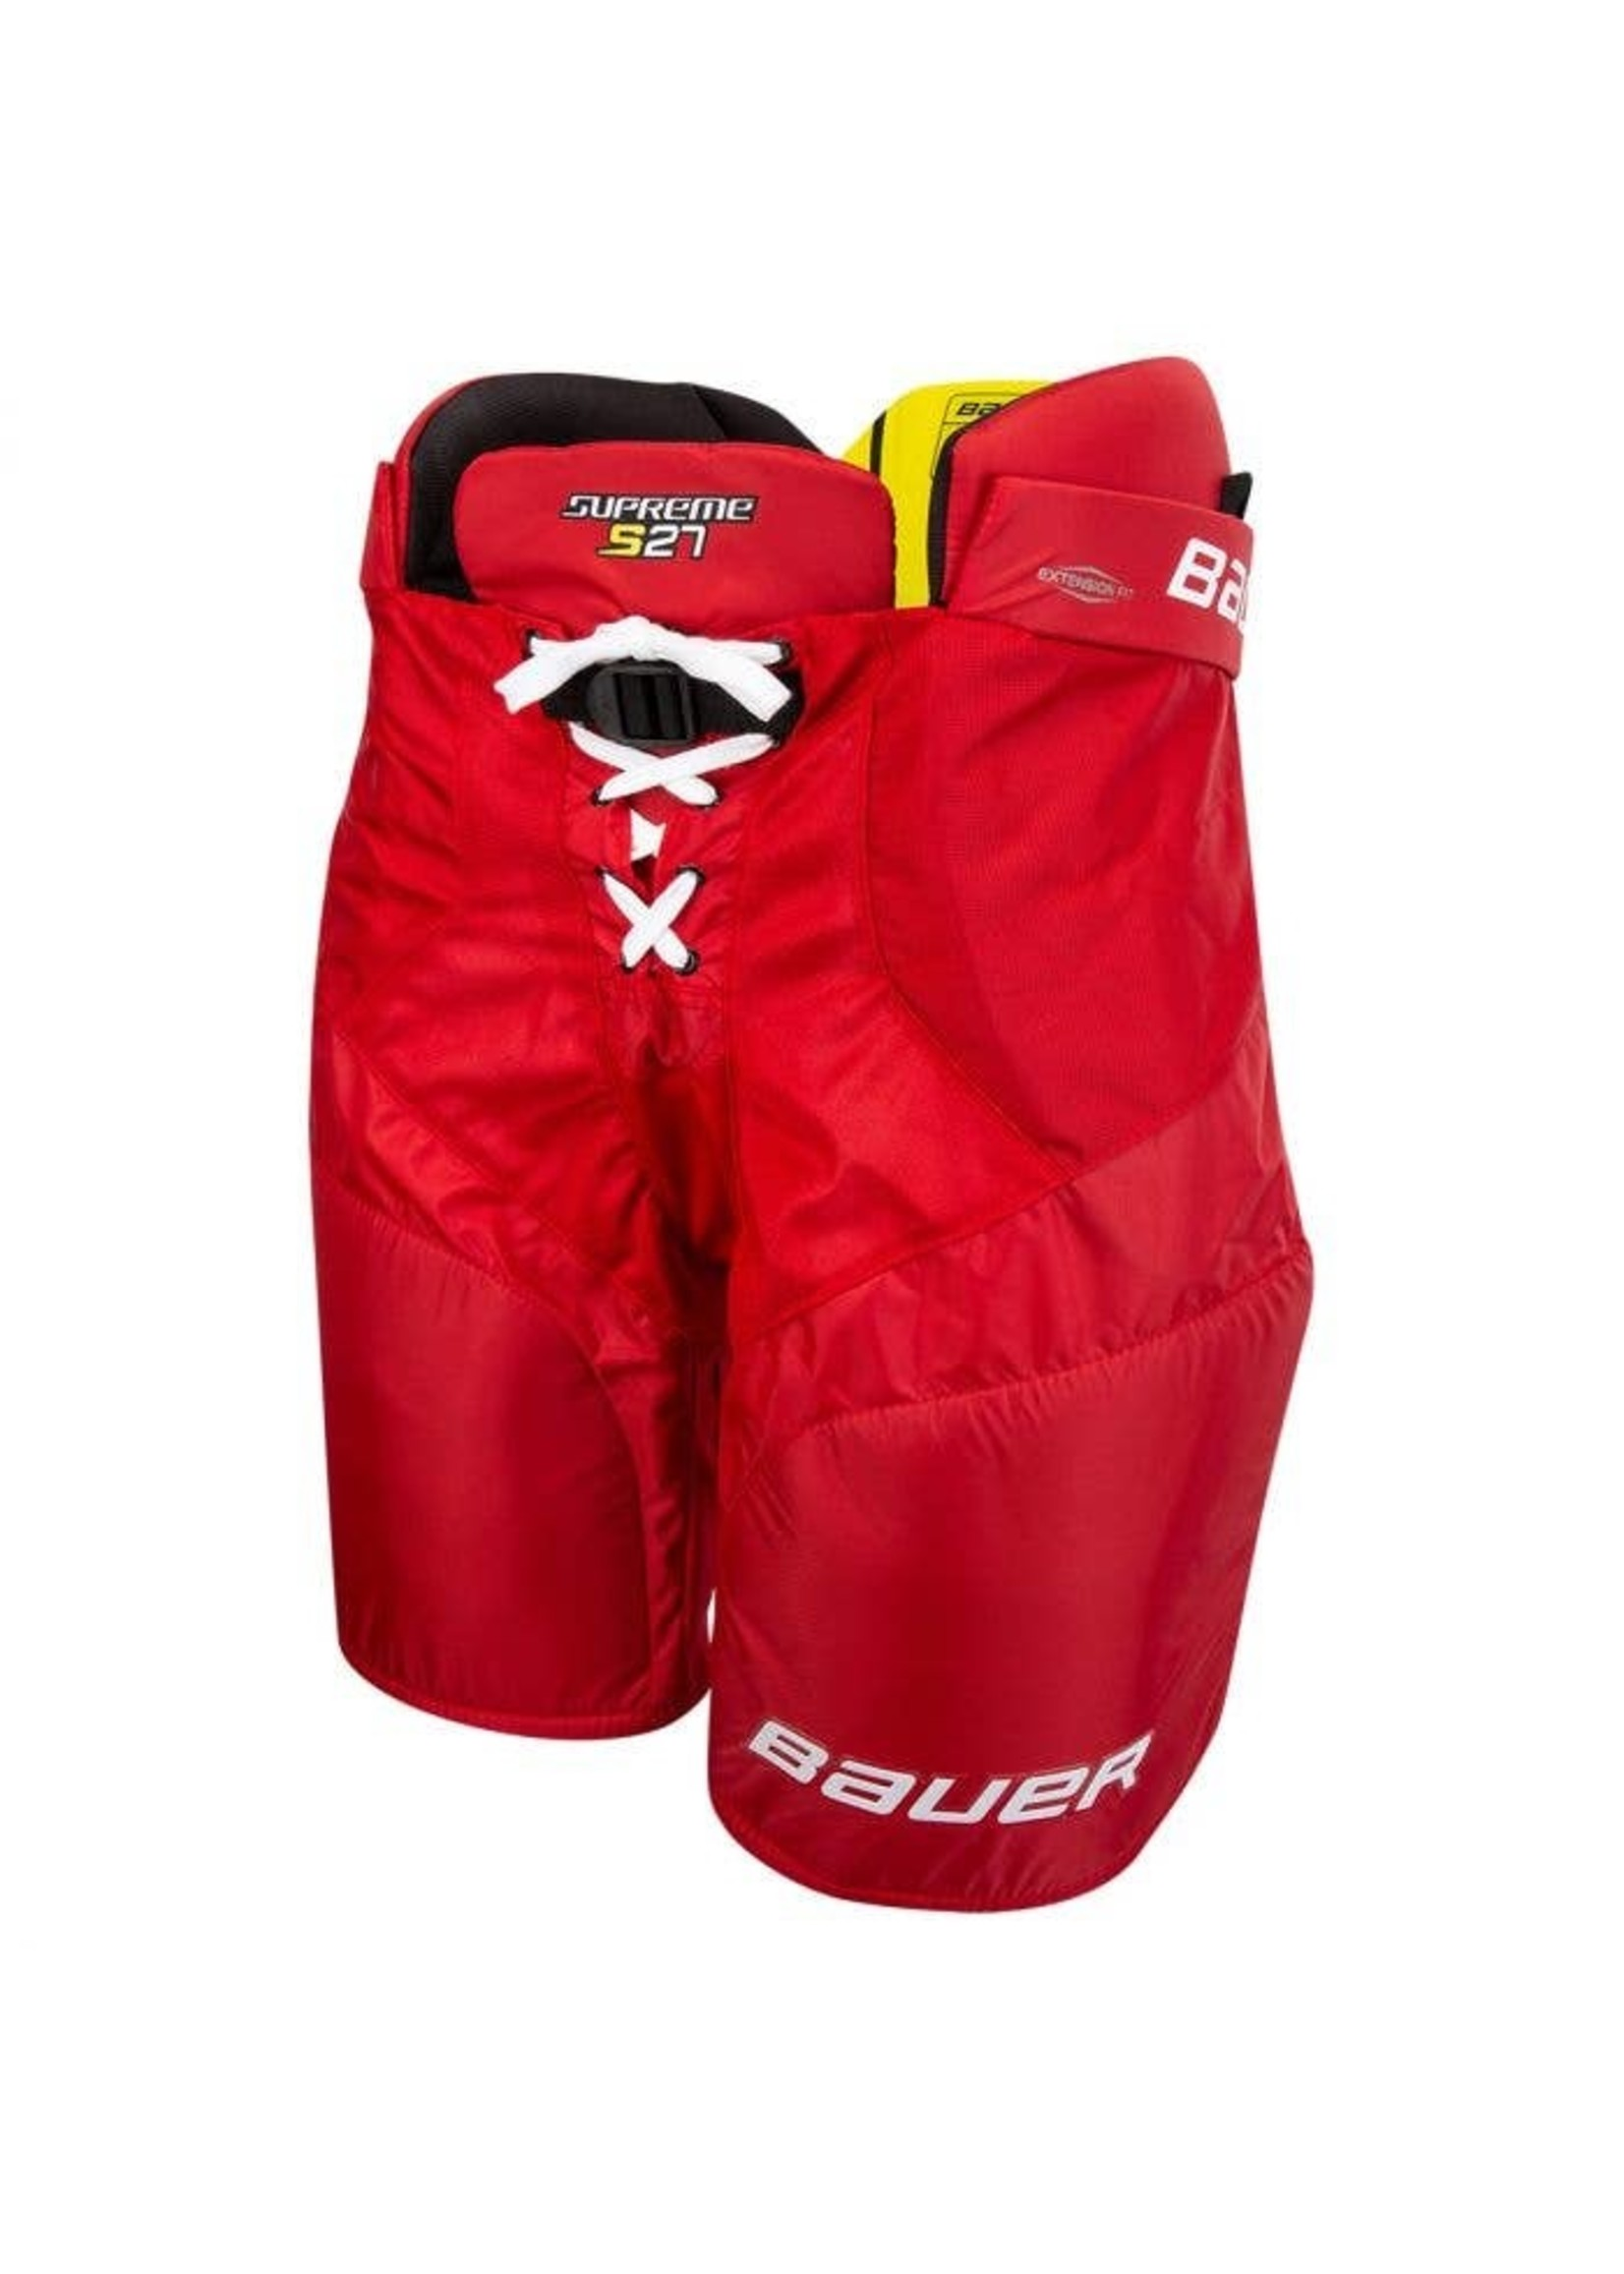 Bauer Hockey BAUER S19 SUPREME S27 JR PANTS